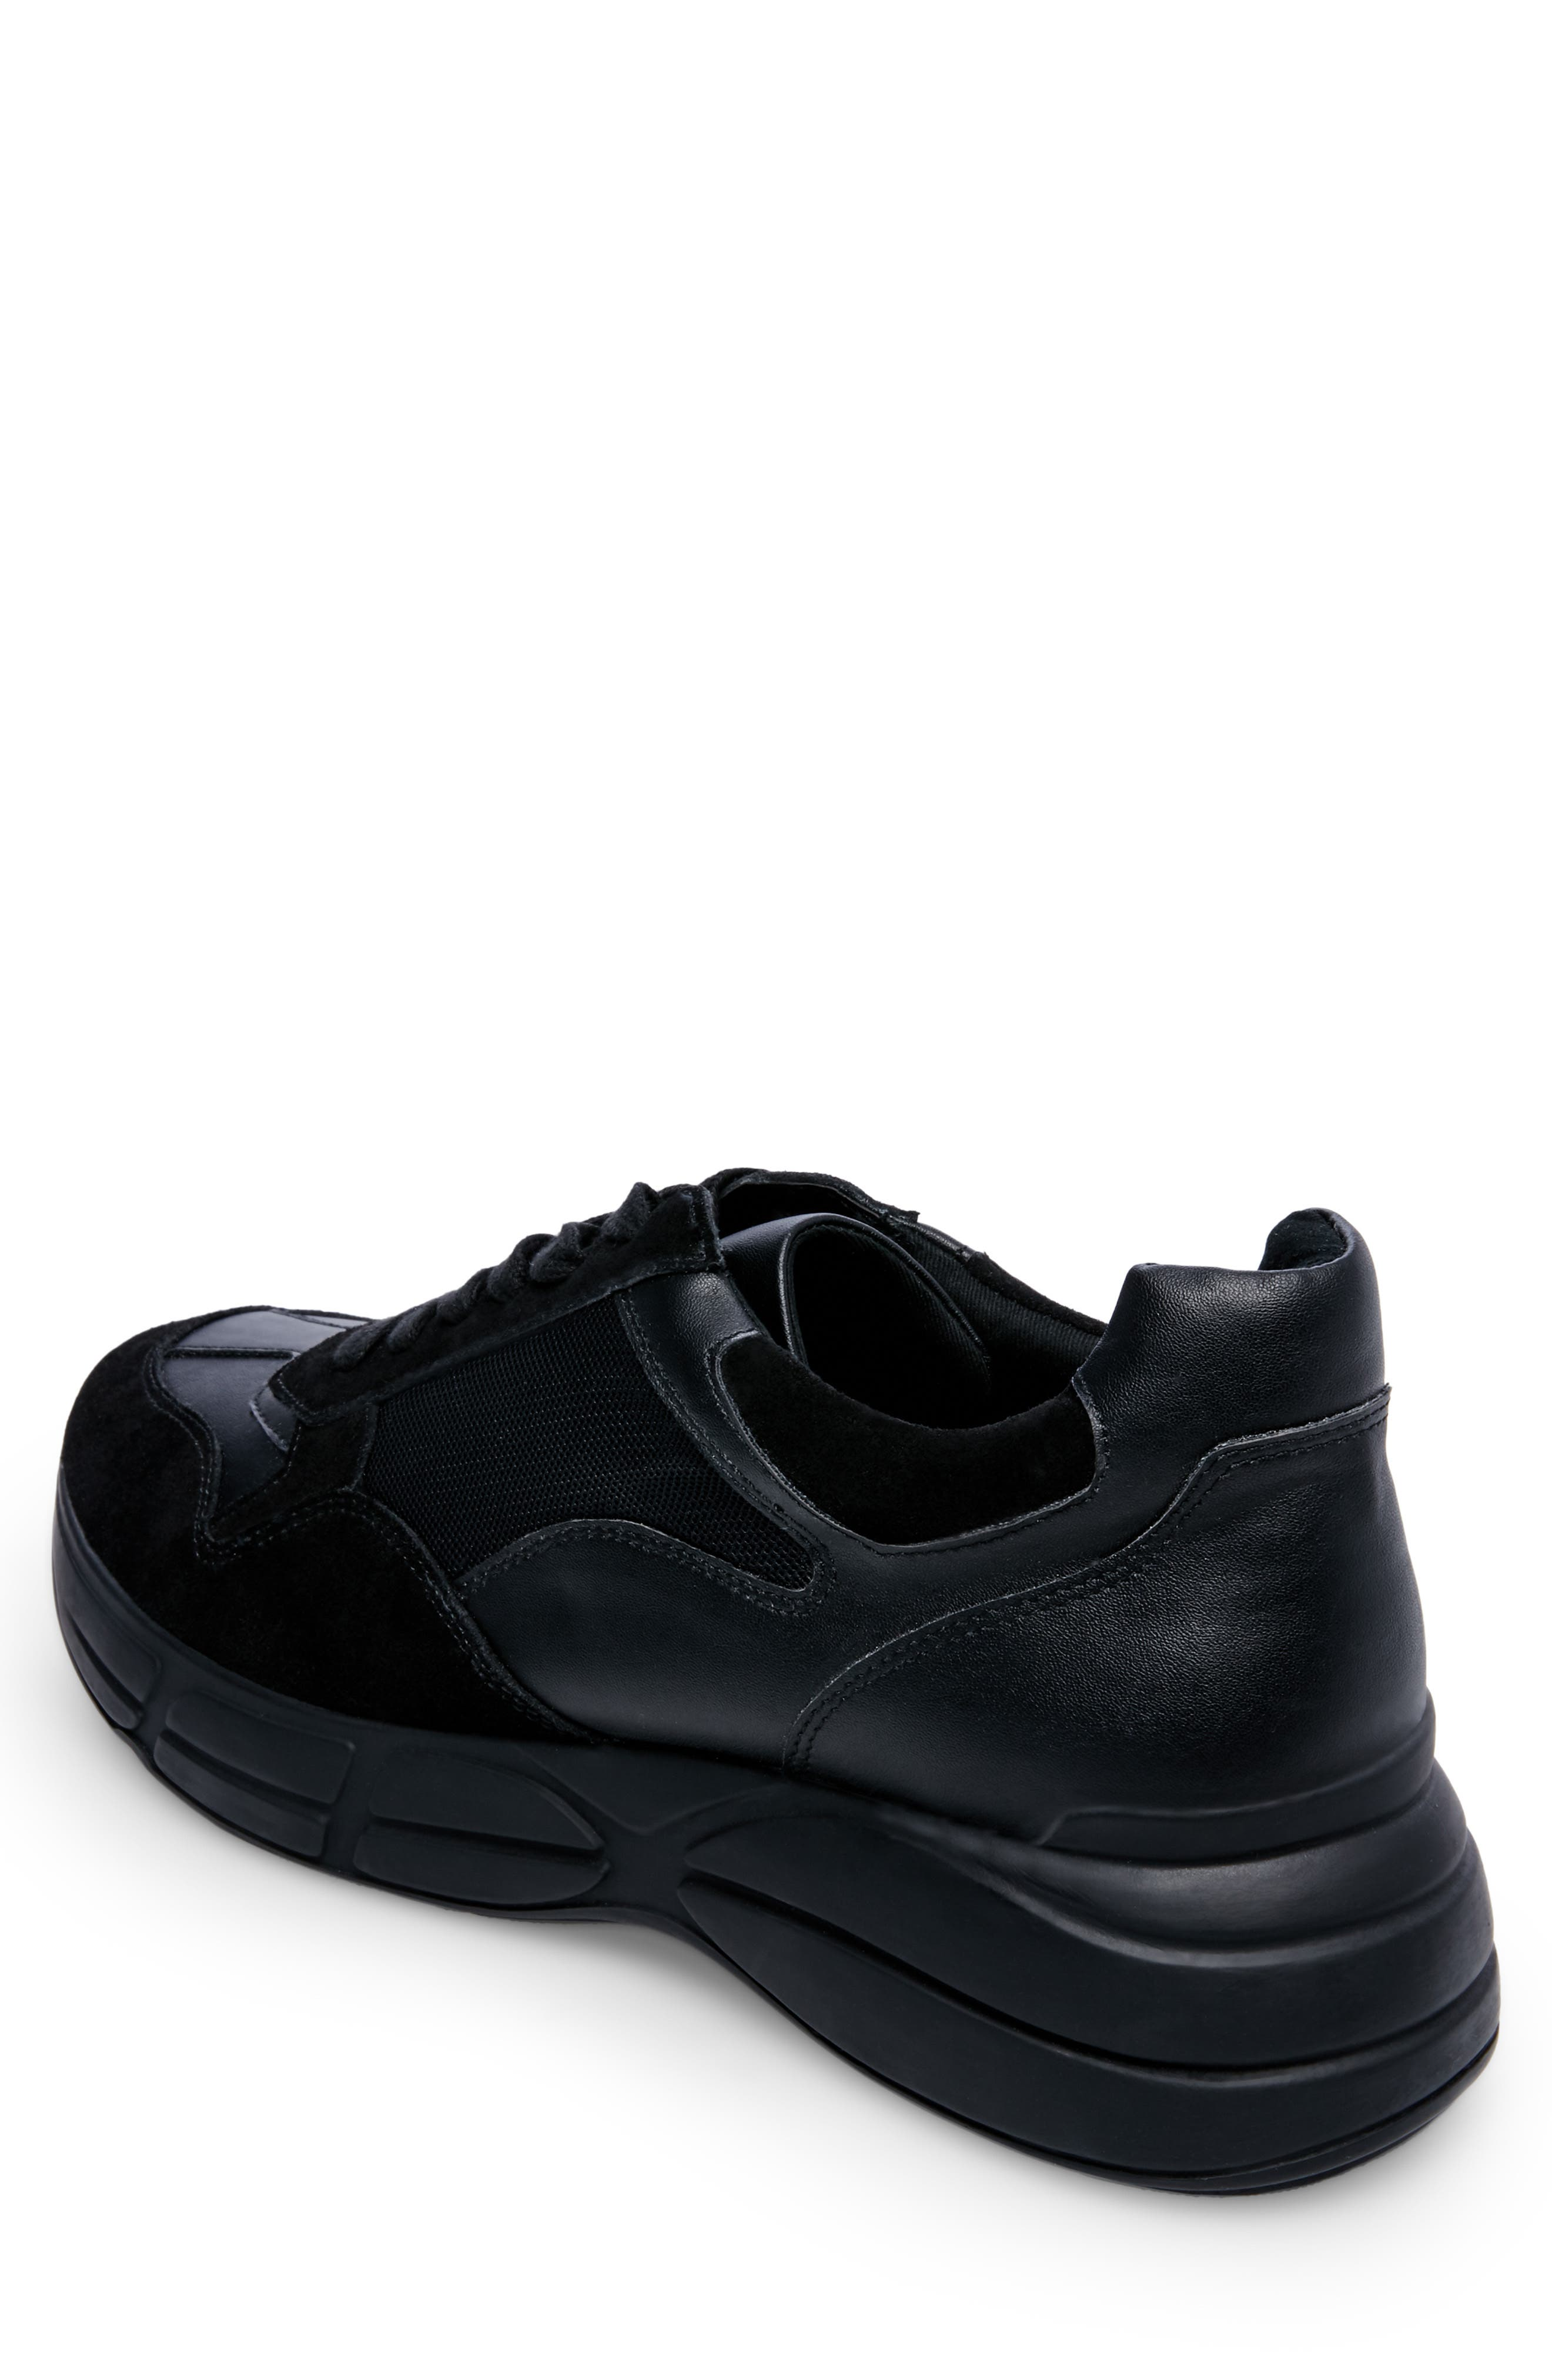 Cole Sneaker,                             Alternate thumbnail 2, color,                             002